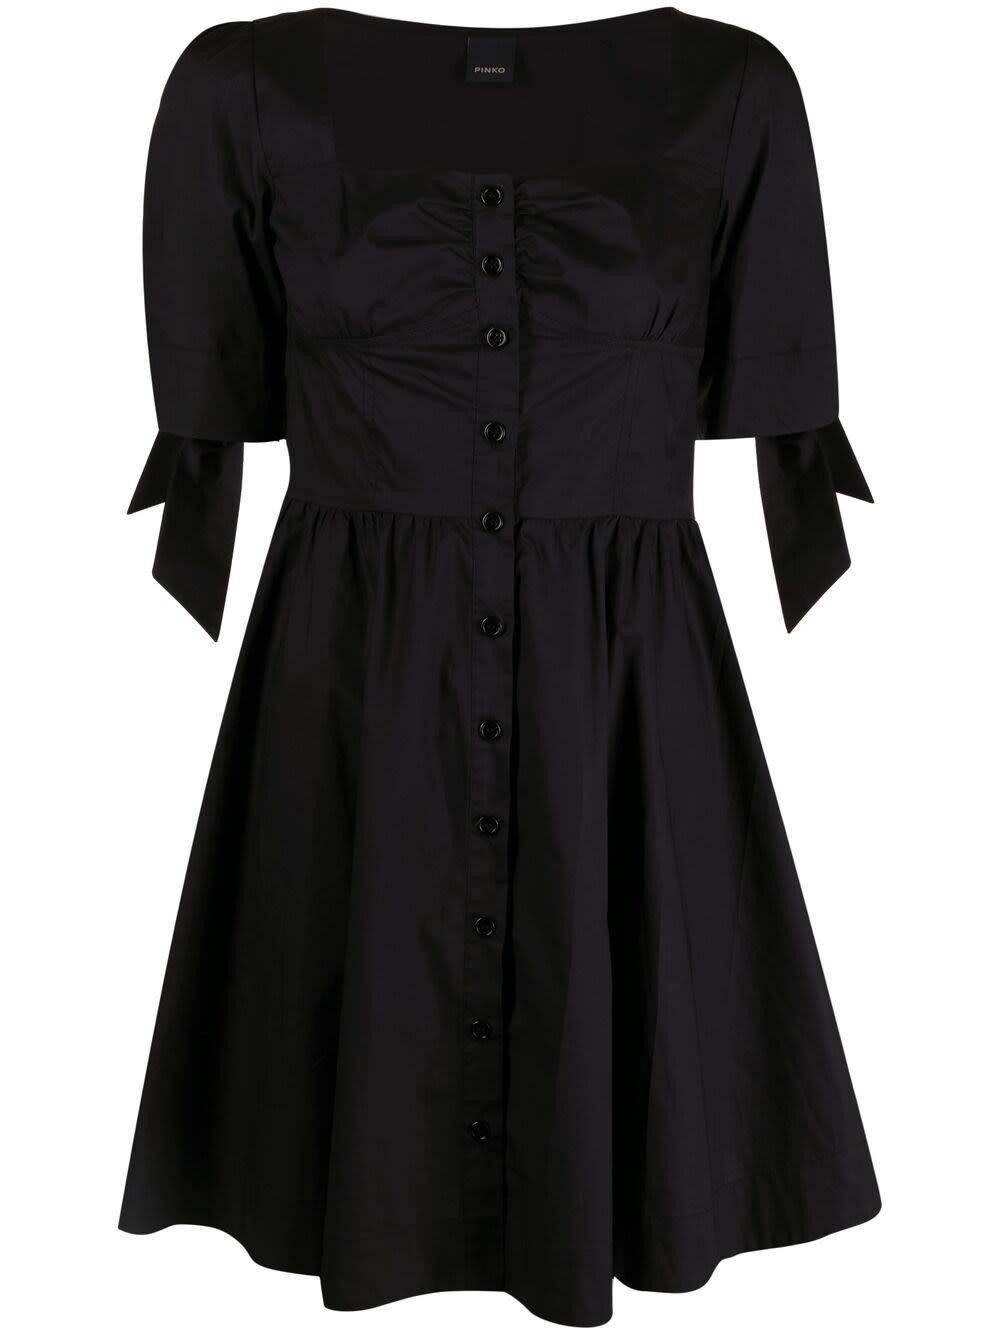 Pinko BLACK COTTON POPLIN DRESS WITH BOWS